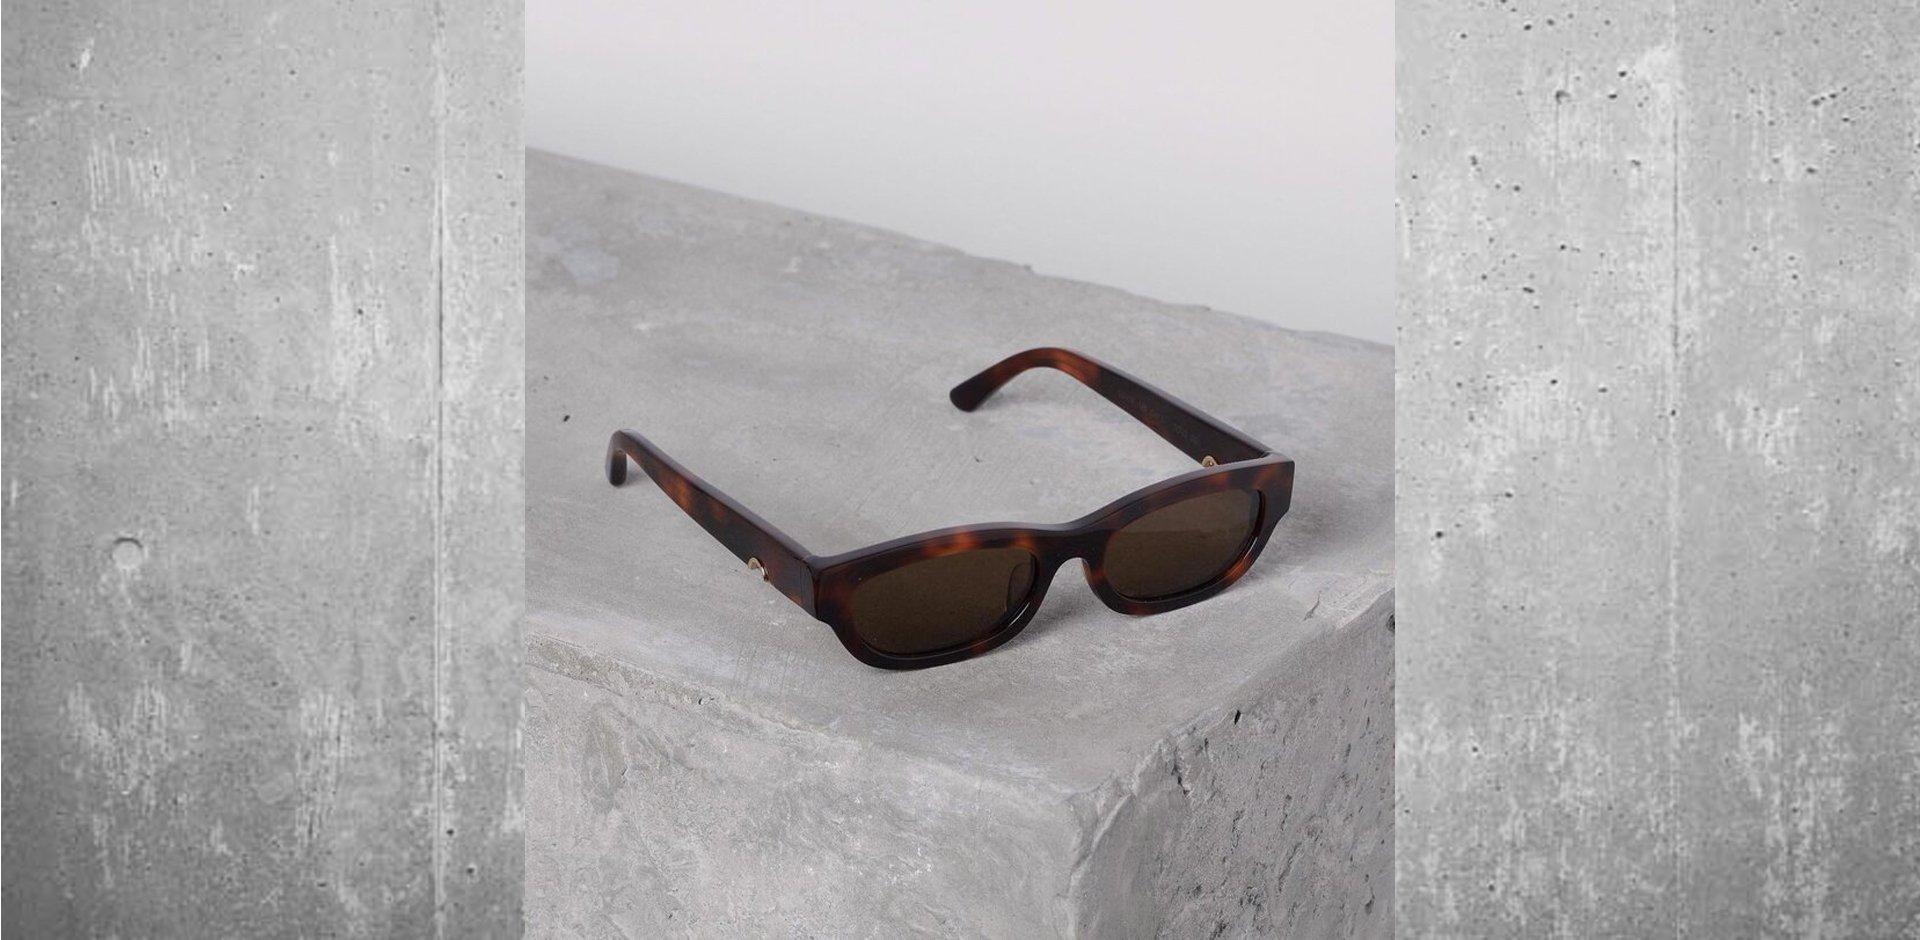 huma sunglasses, occhiali da sole, must have, pe2020